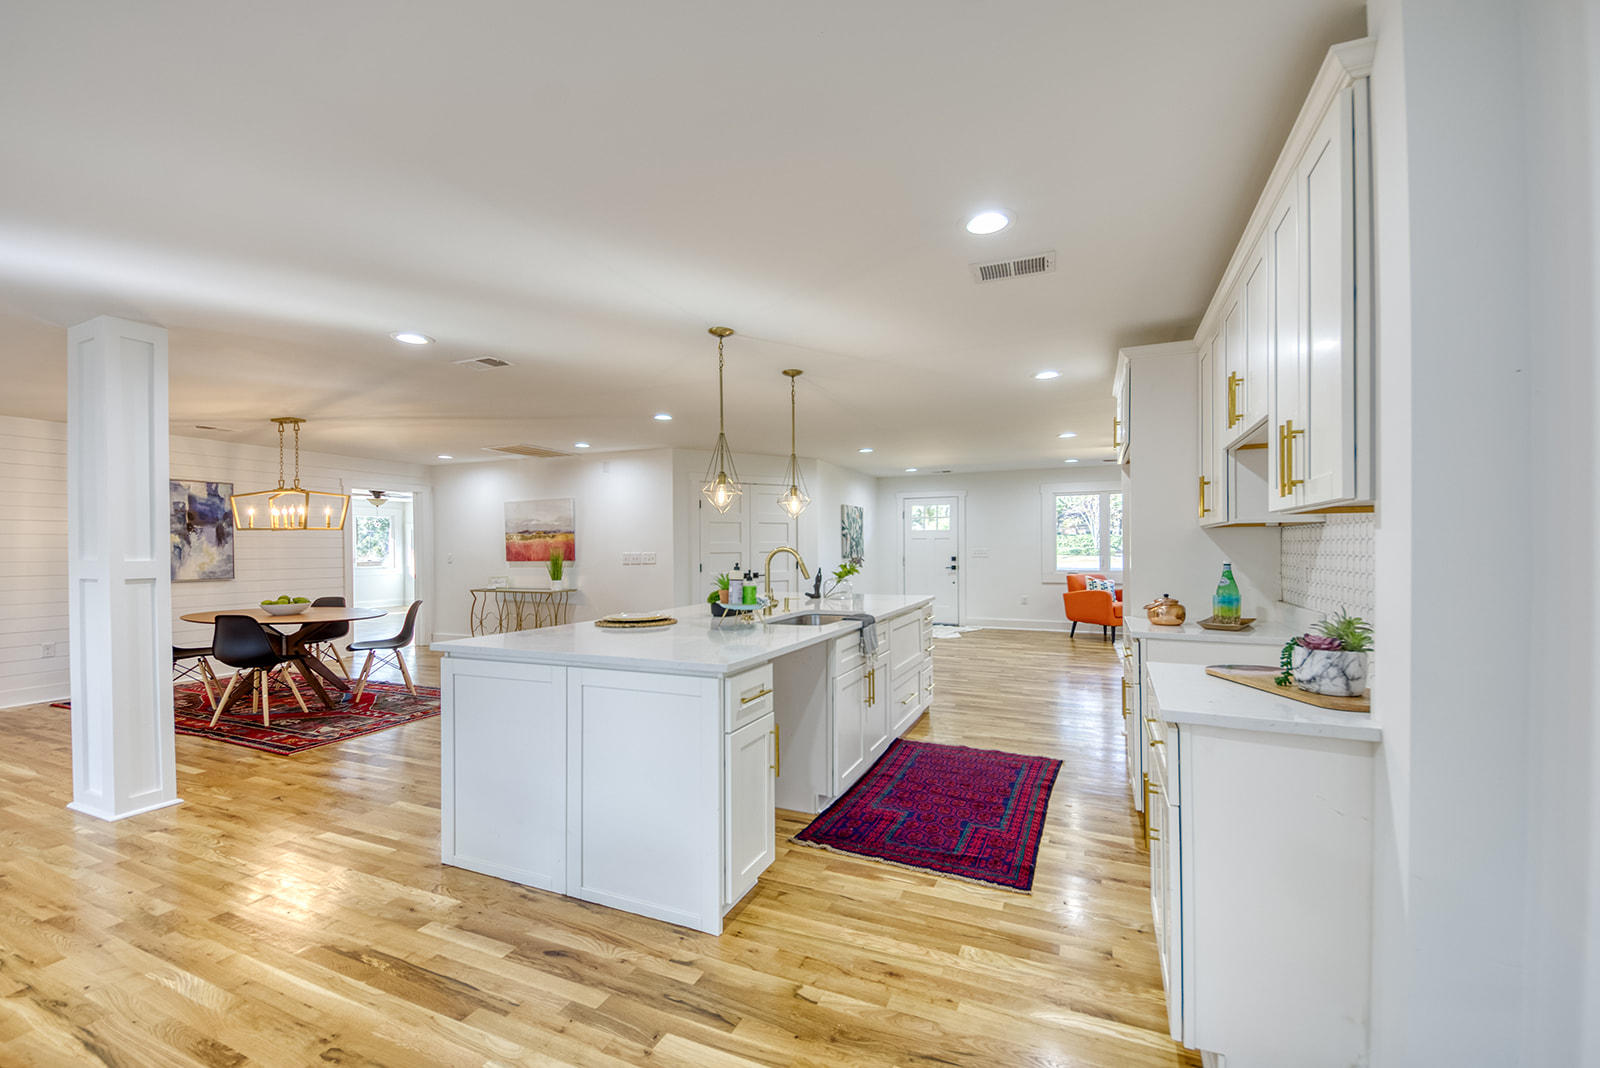 Bay View Acres Homes For Sale - 265 Coleman, Mount Pleasant, SC - 32